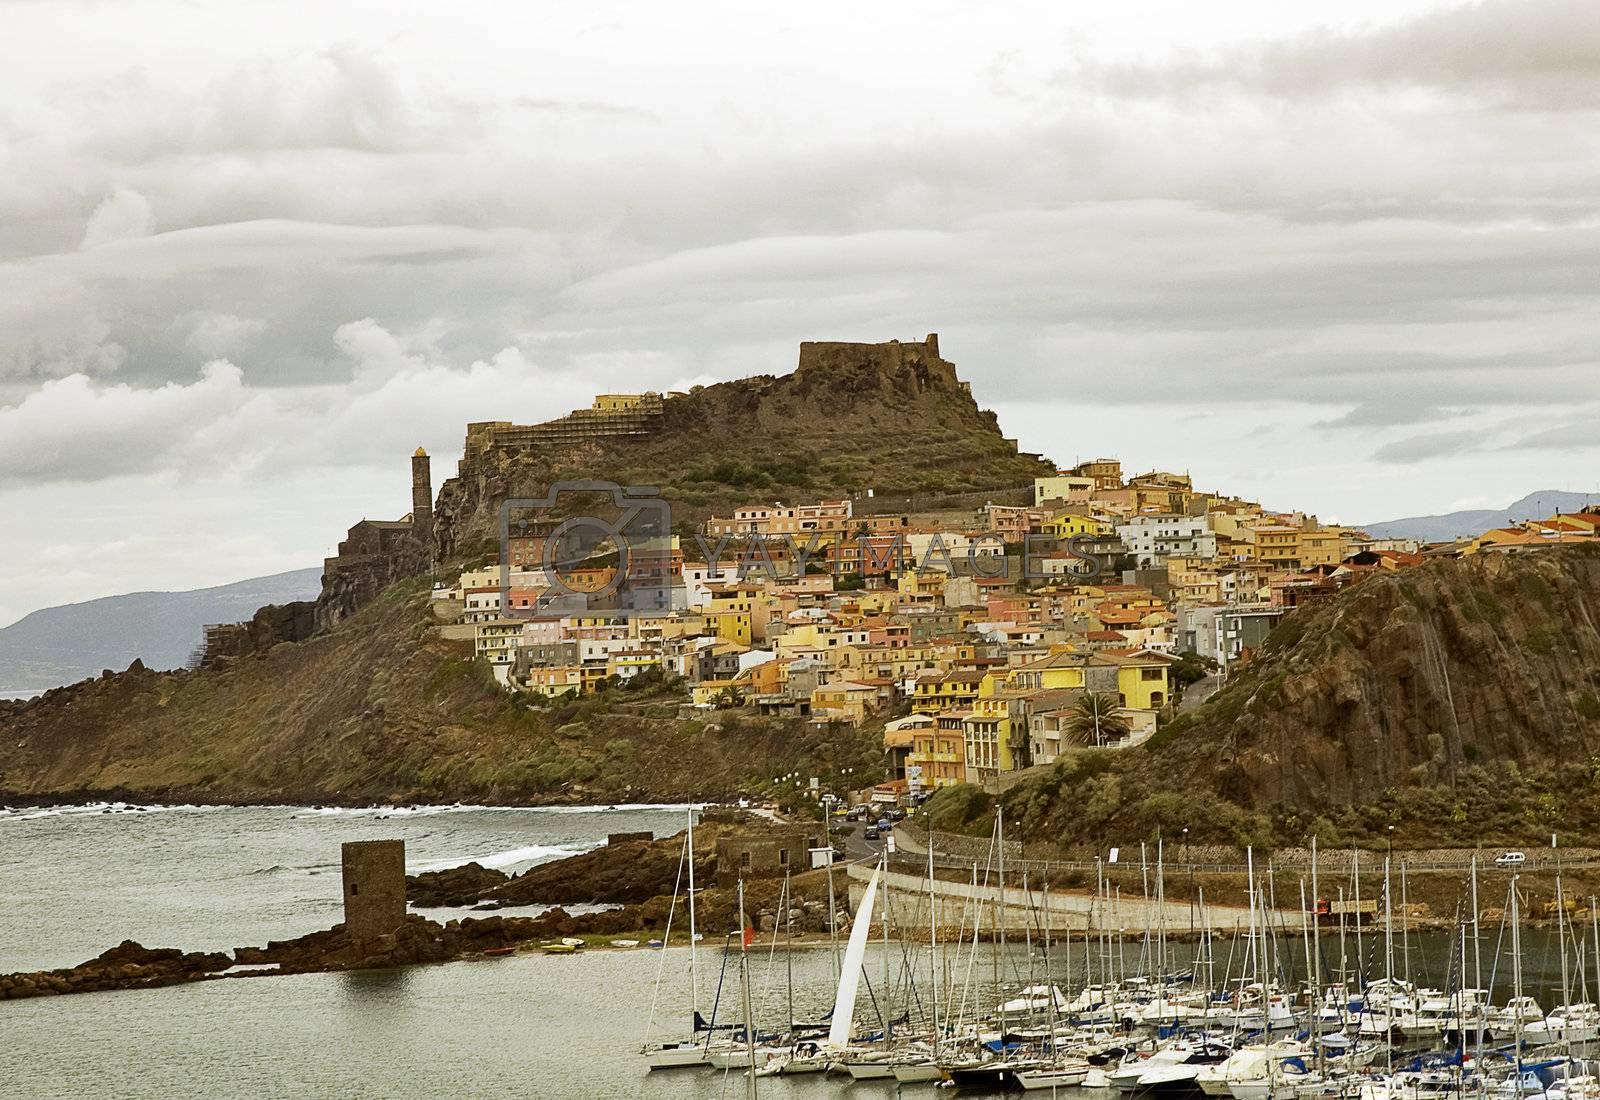 View the Castelsardo